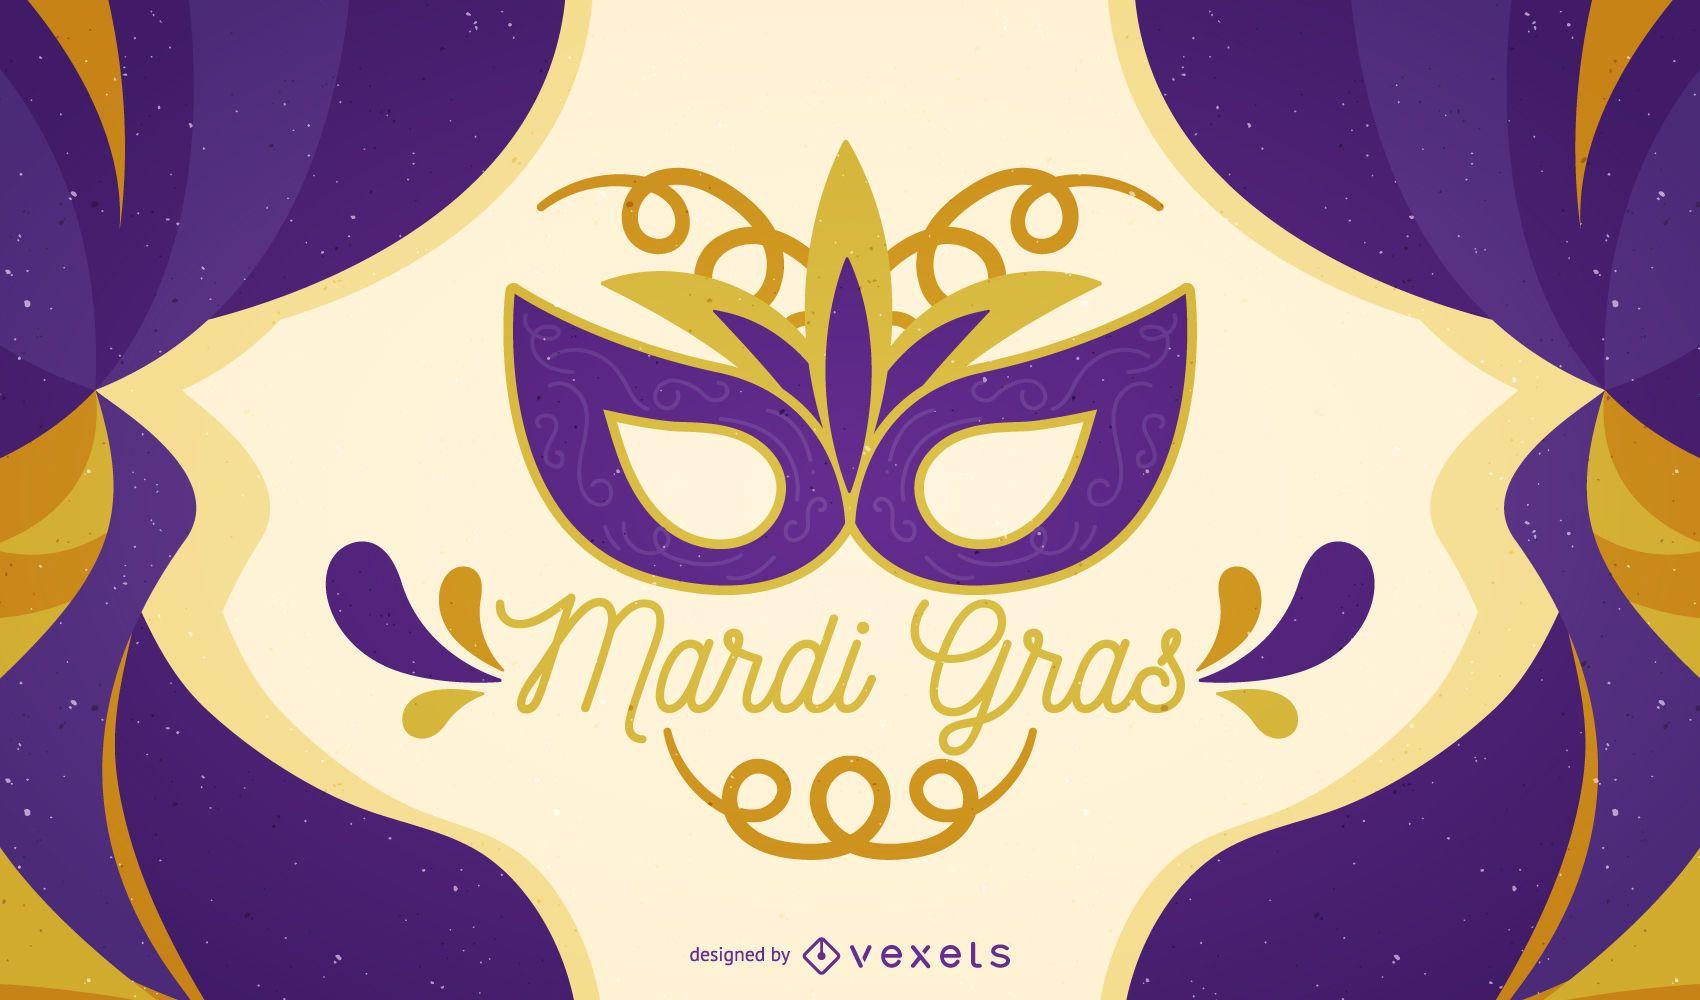 Pôster do carnaval Mardi Gras